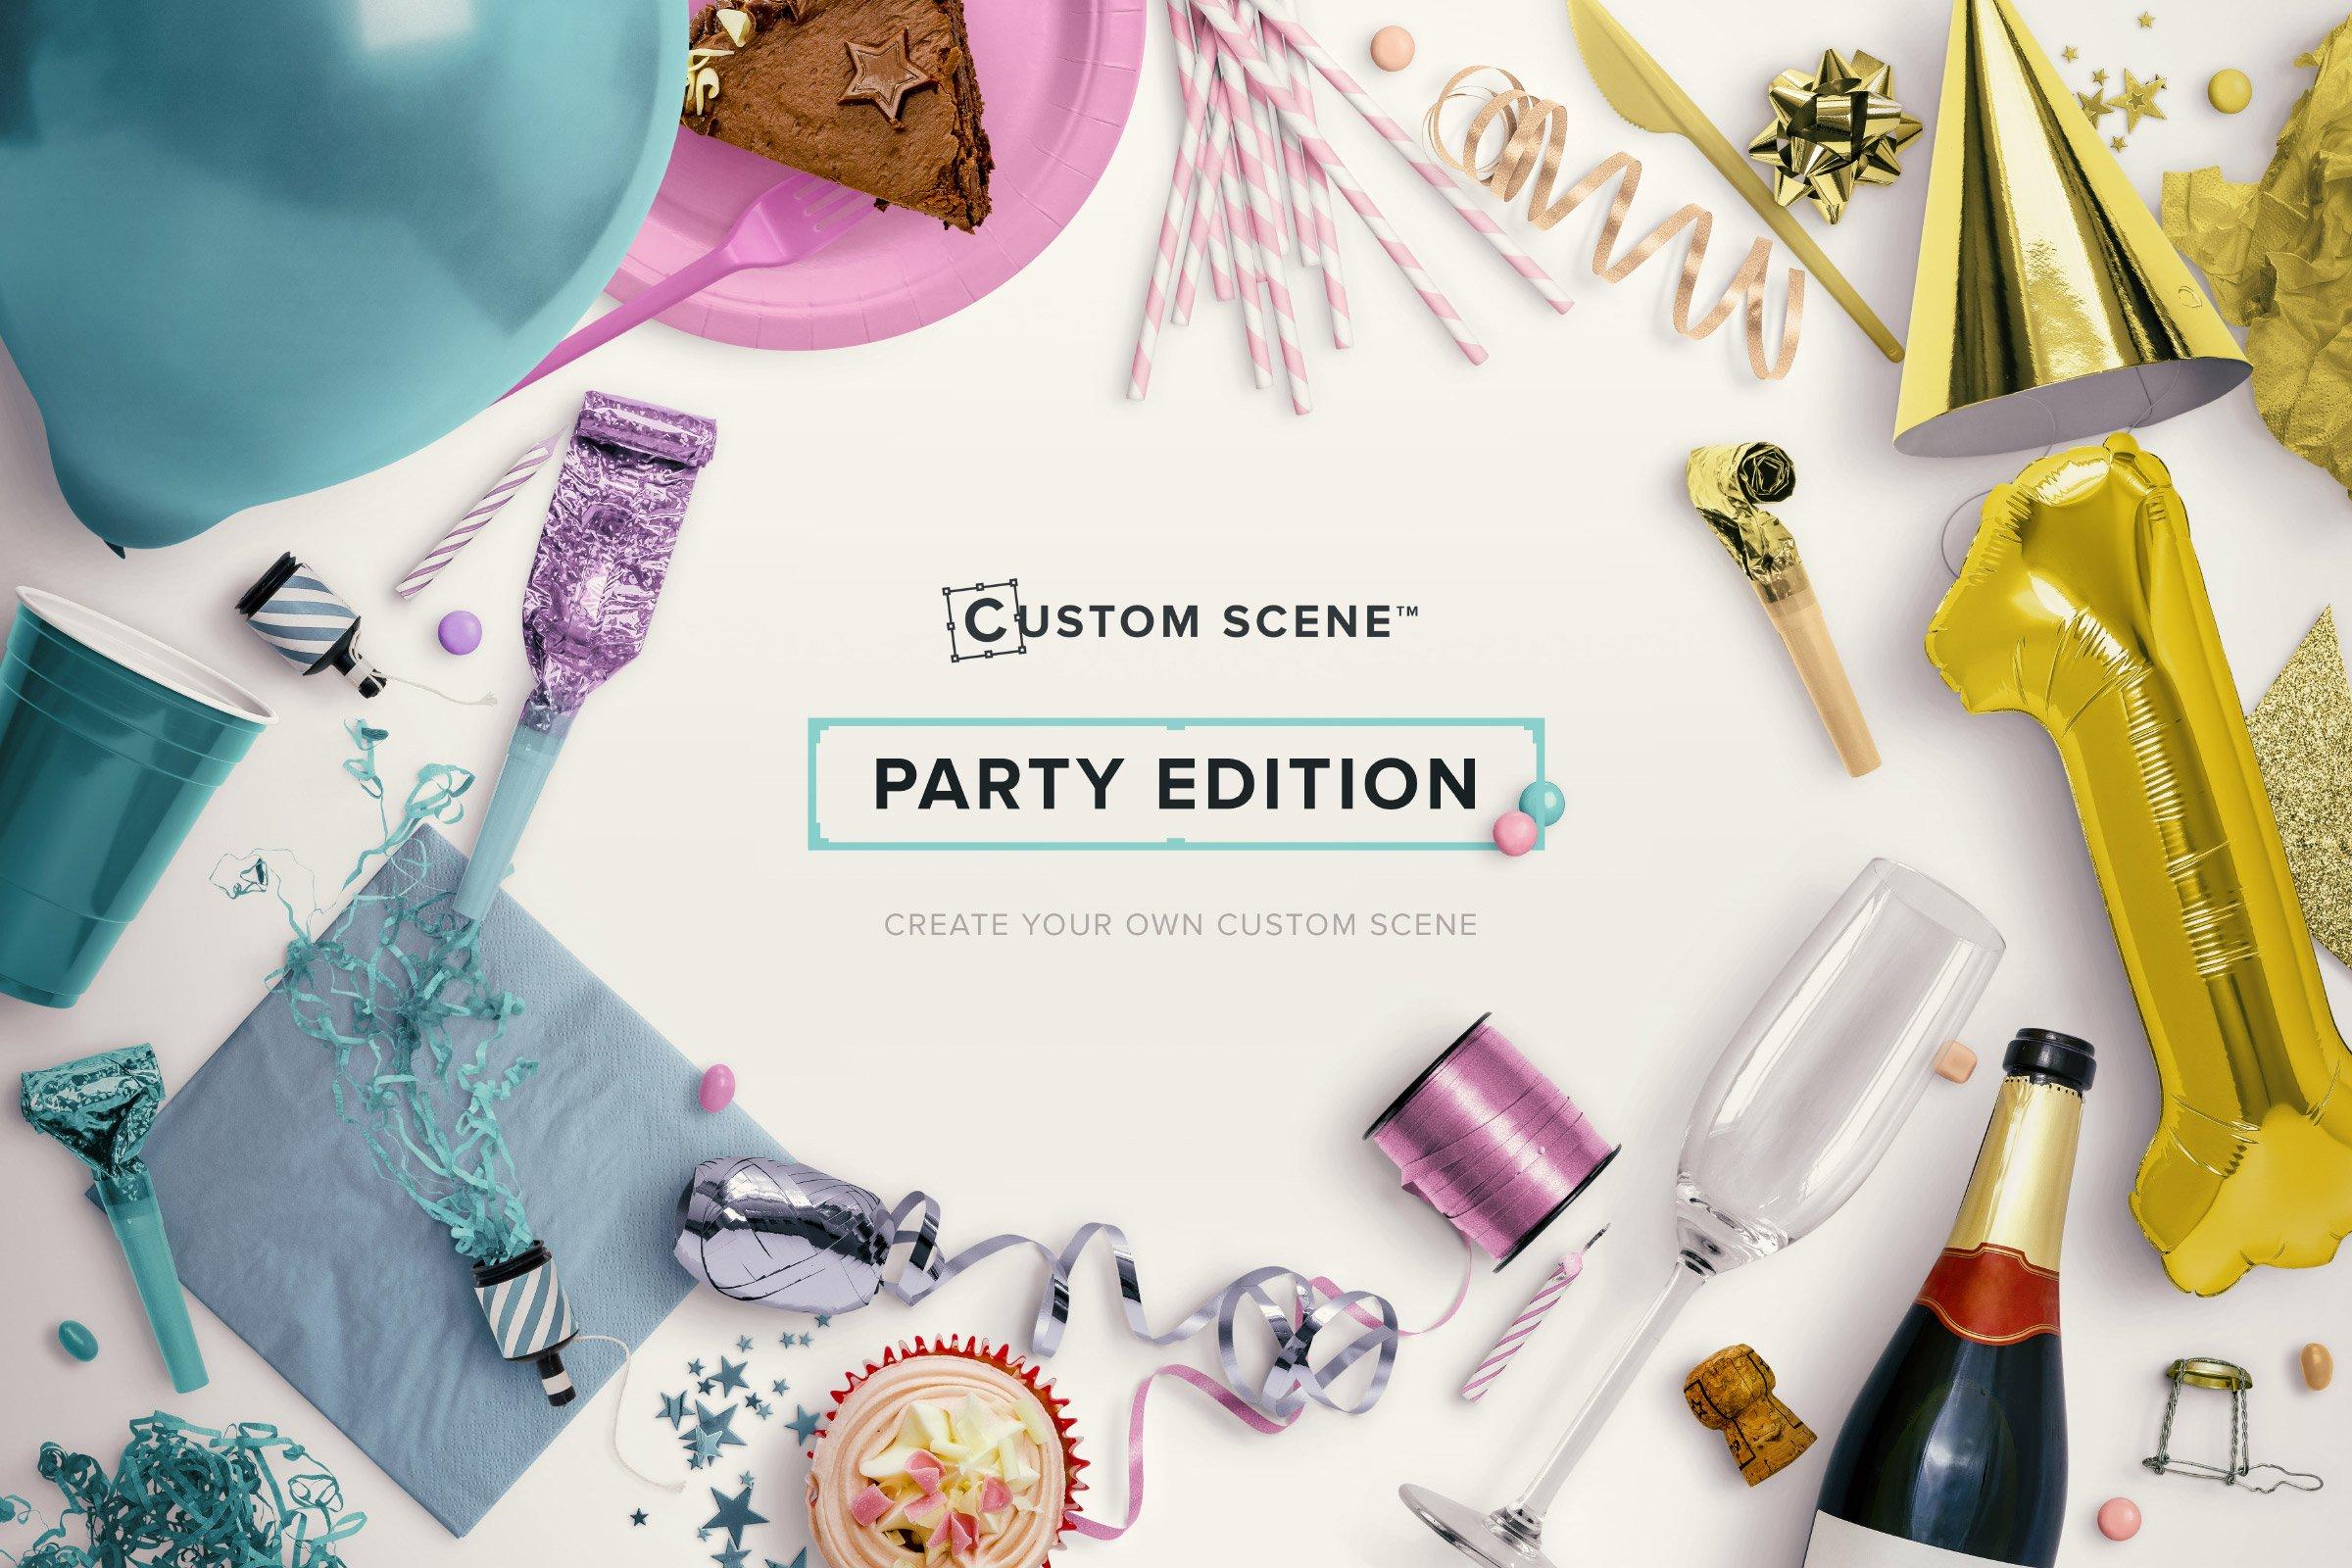 party edition custom scene cover